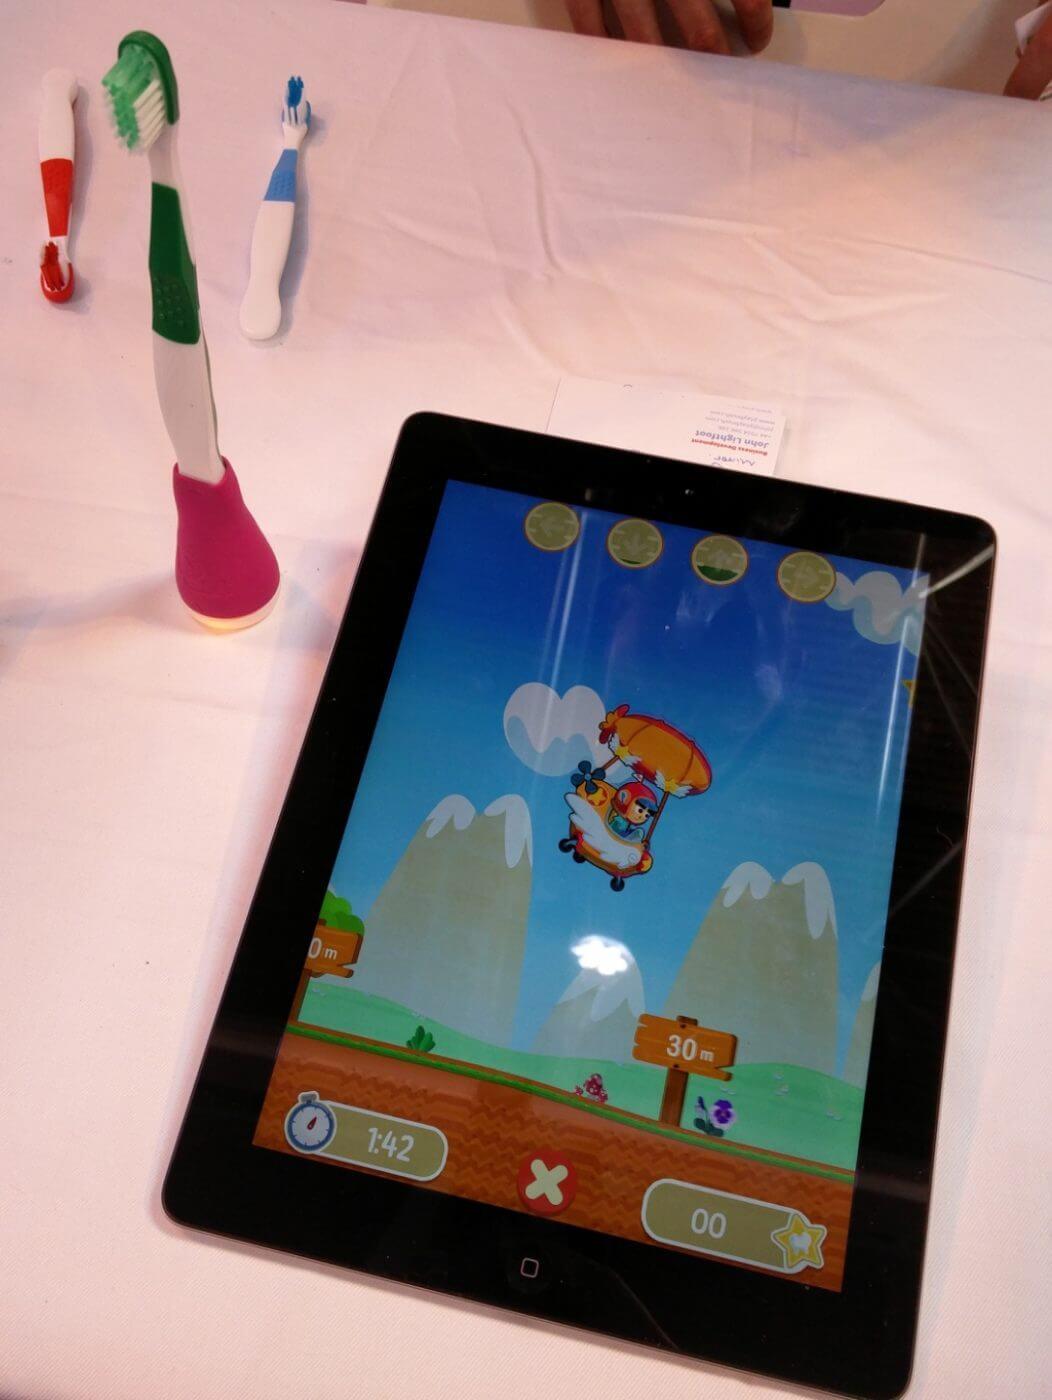 Playbrush with app